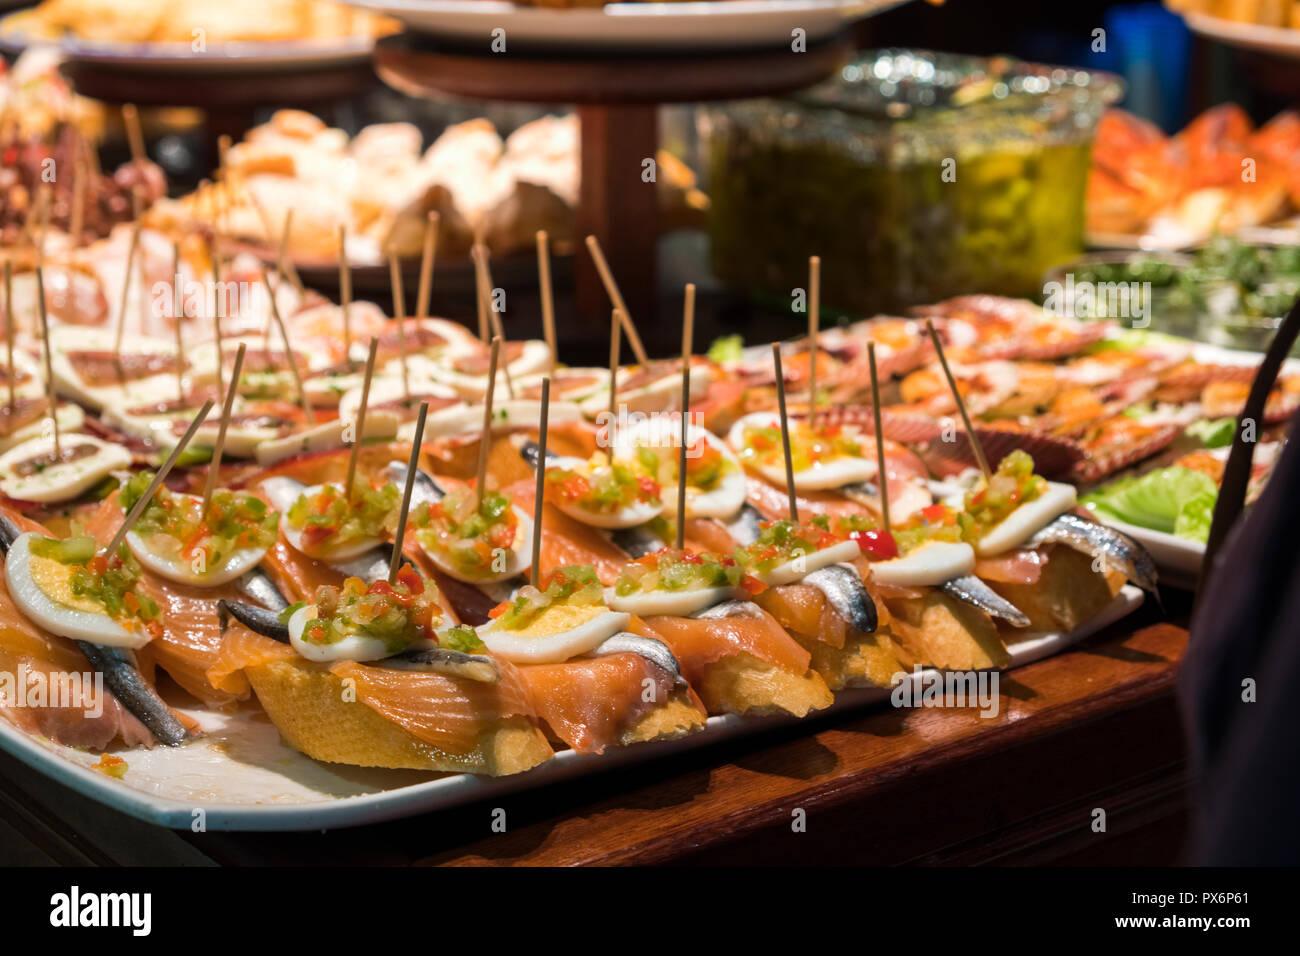 Tapas or Pintxos in San Sebastian, Donostia, Basque Country, Spain, Europe - Stock Image